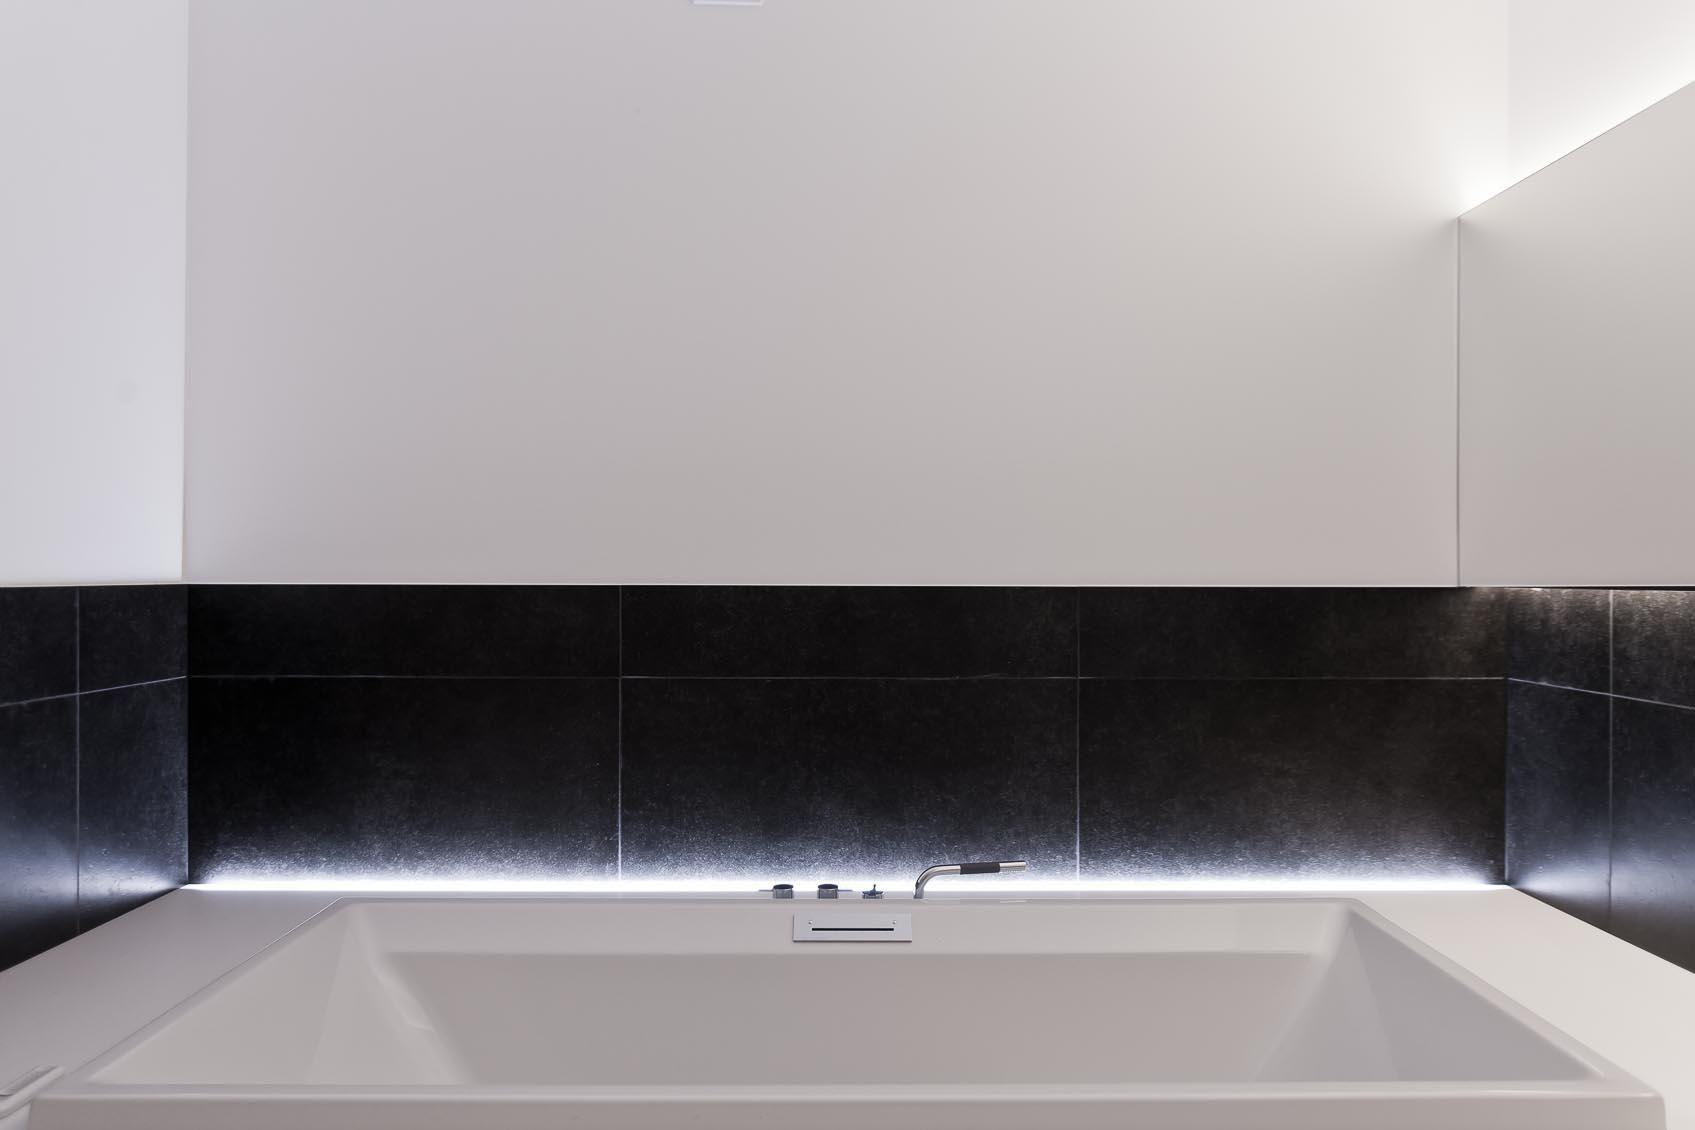 Led Verlichting Badkamer : Rgb led verlichting indirect ingewerkt in badkamer